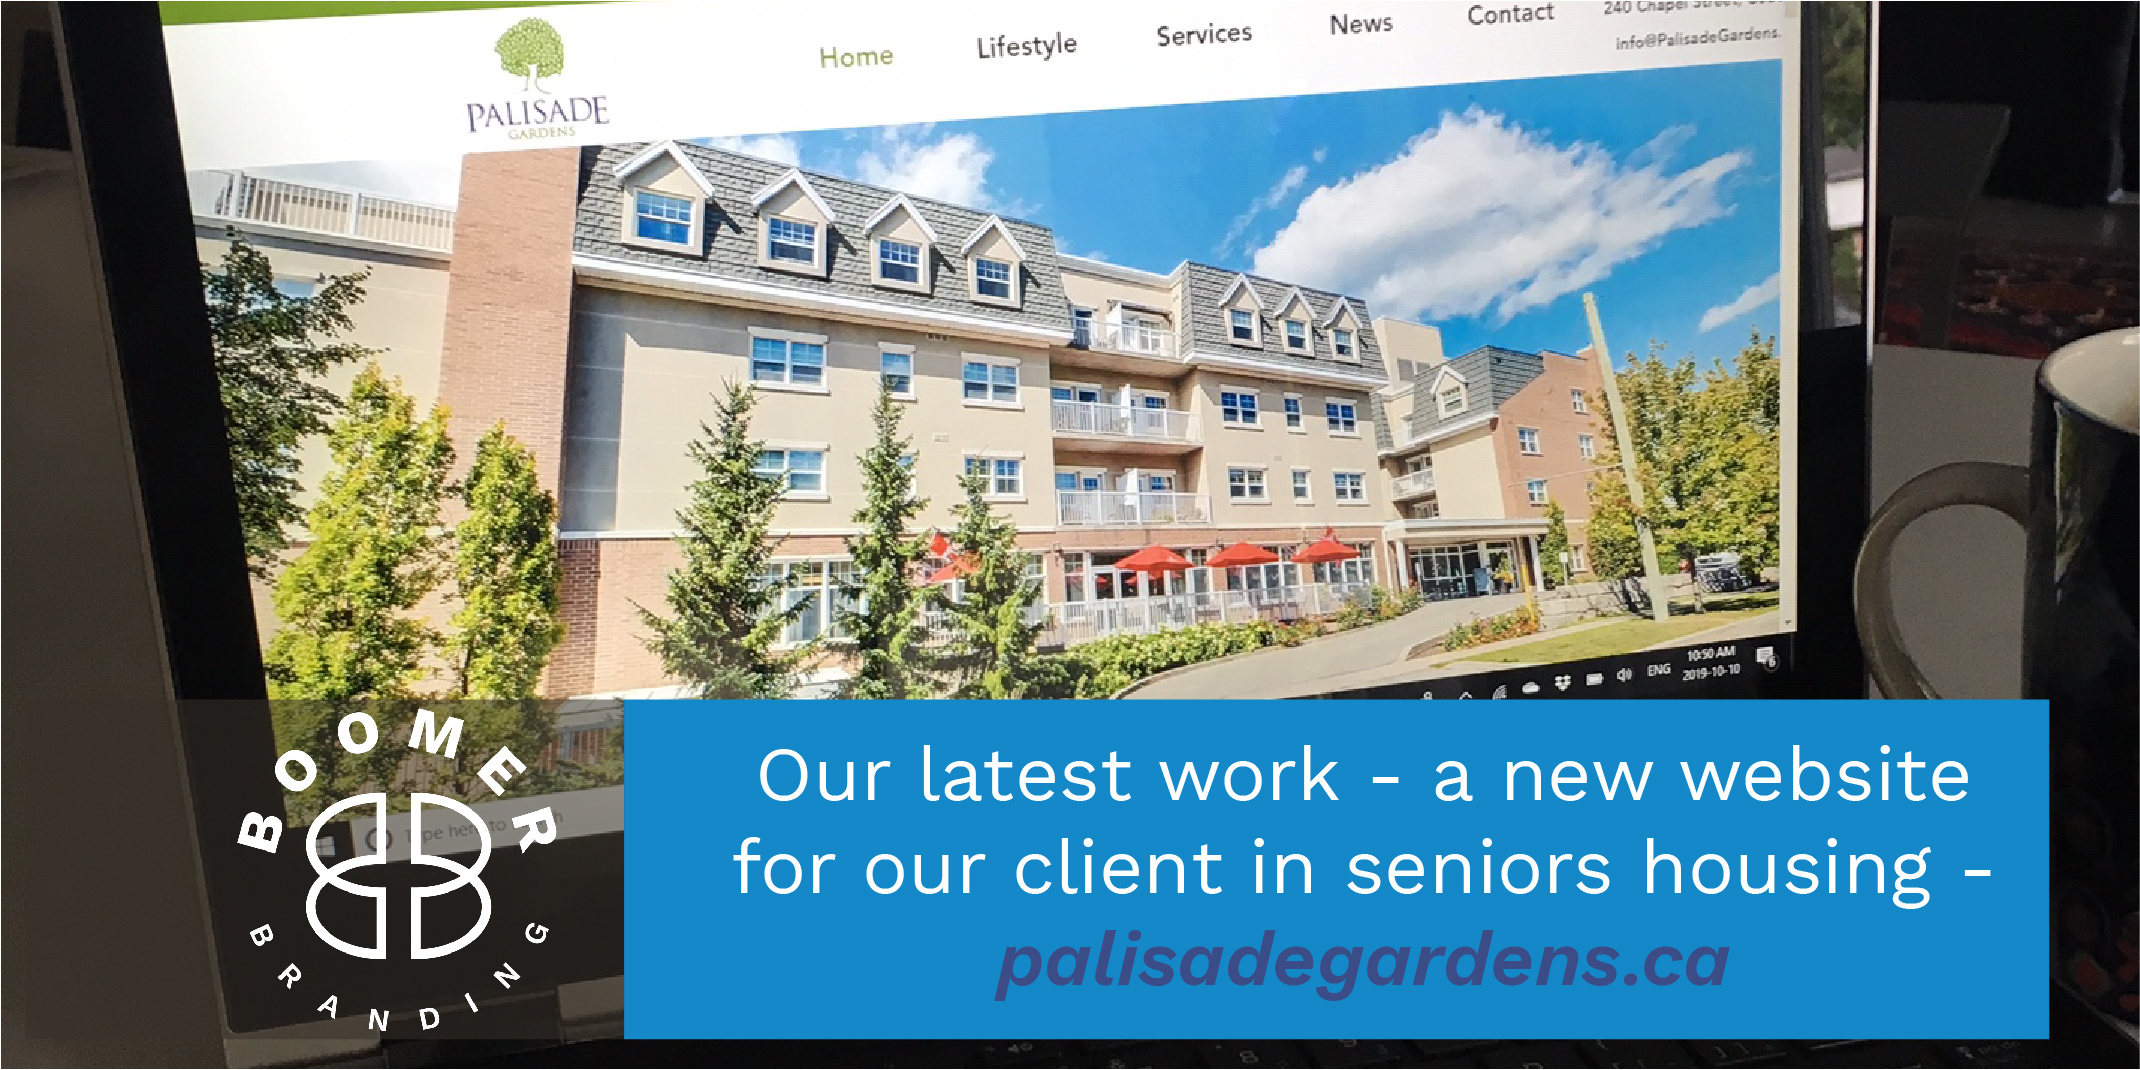 Website design by Boomer Branding